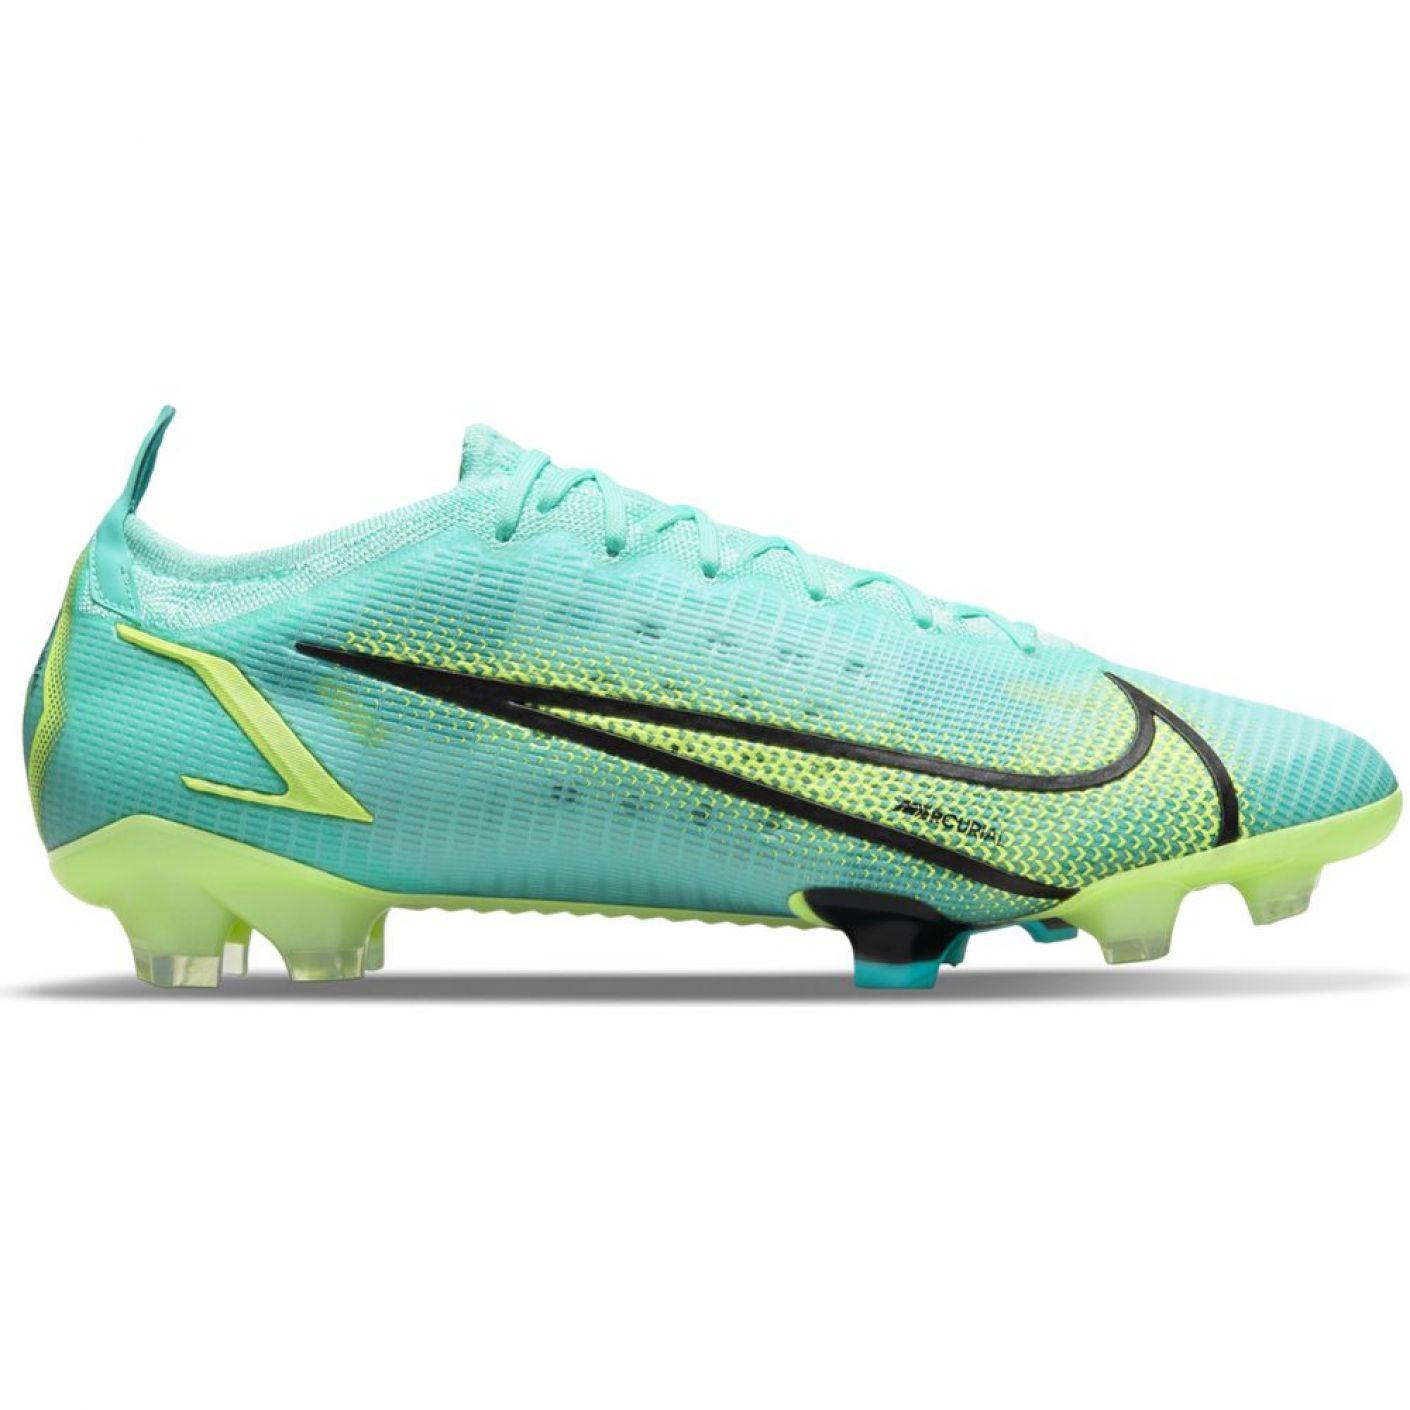 Nike Mercurial Vapor 14 Elite Gras Voetbalschoenen (FG) Turquoise Lime